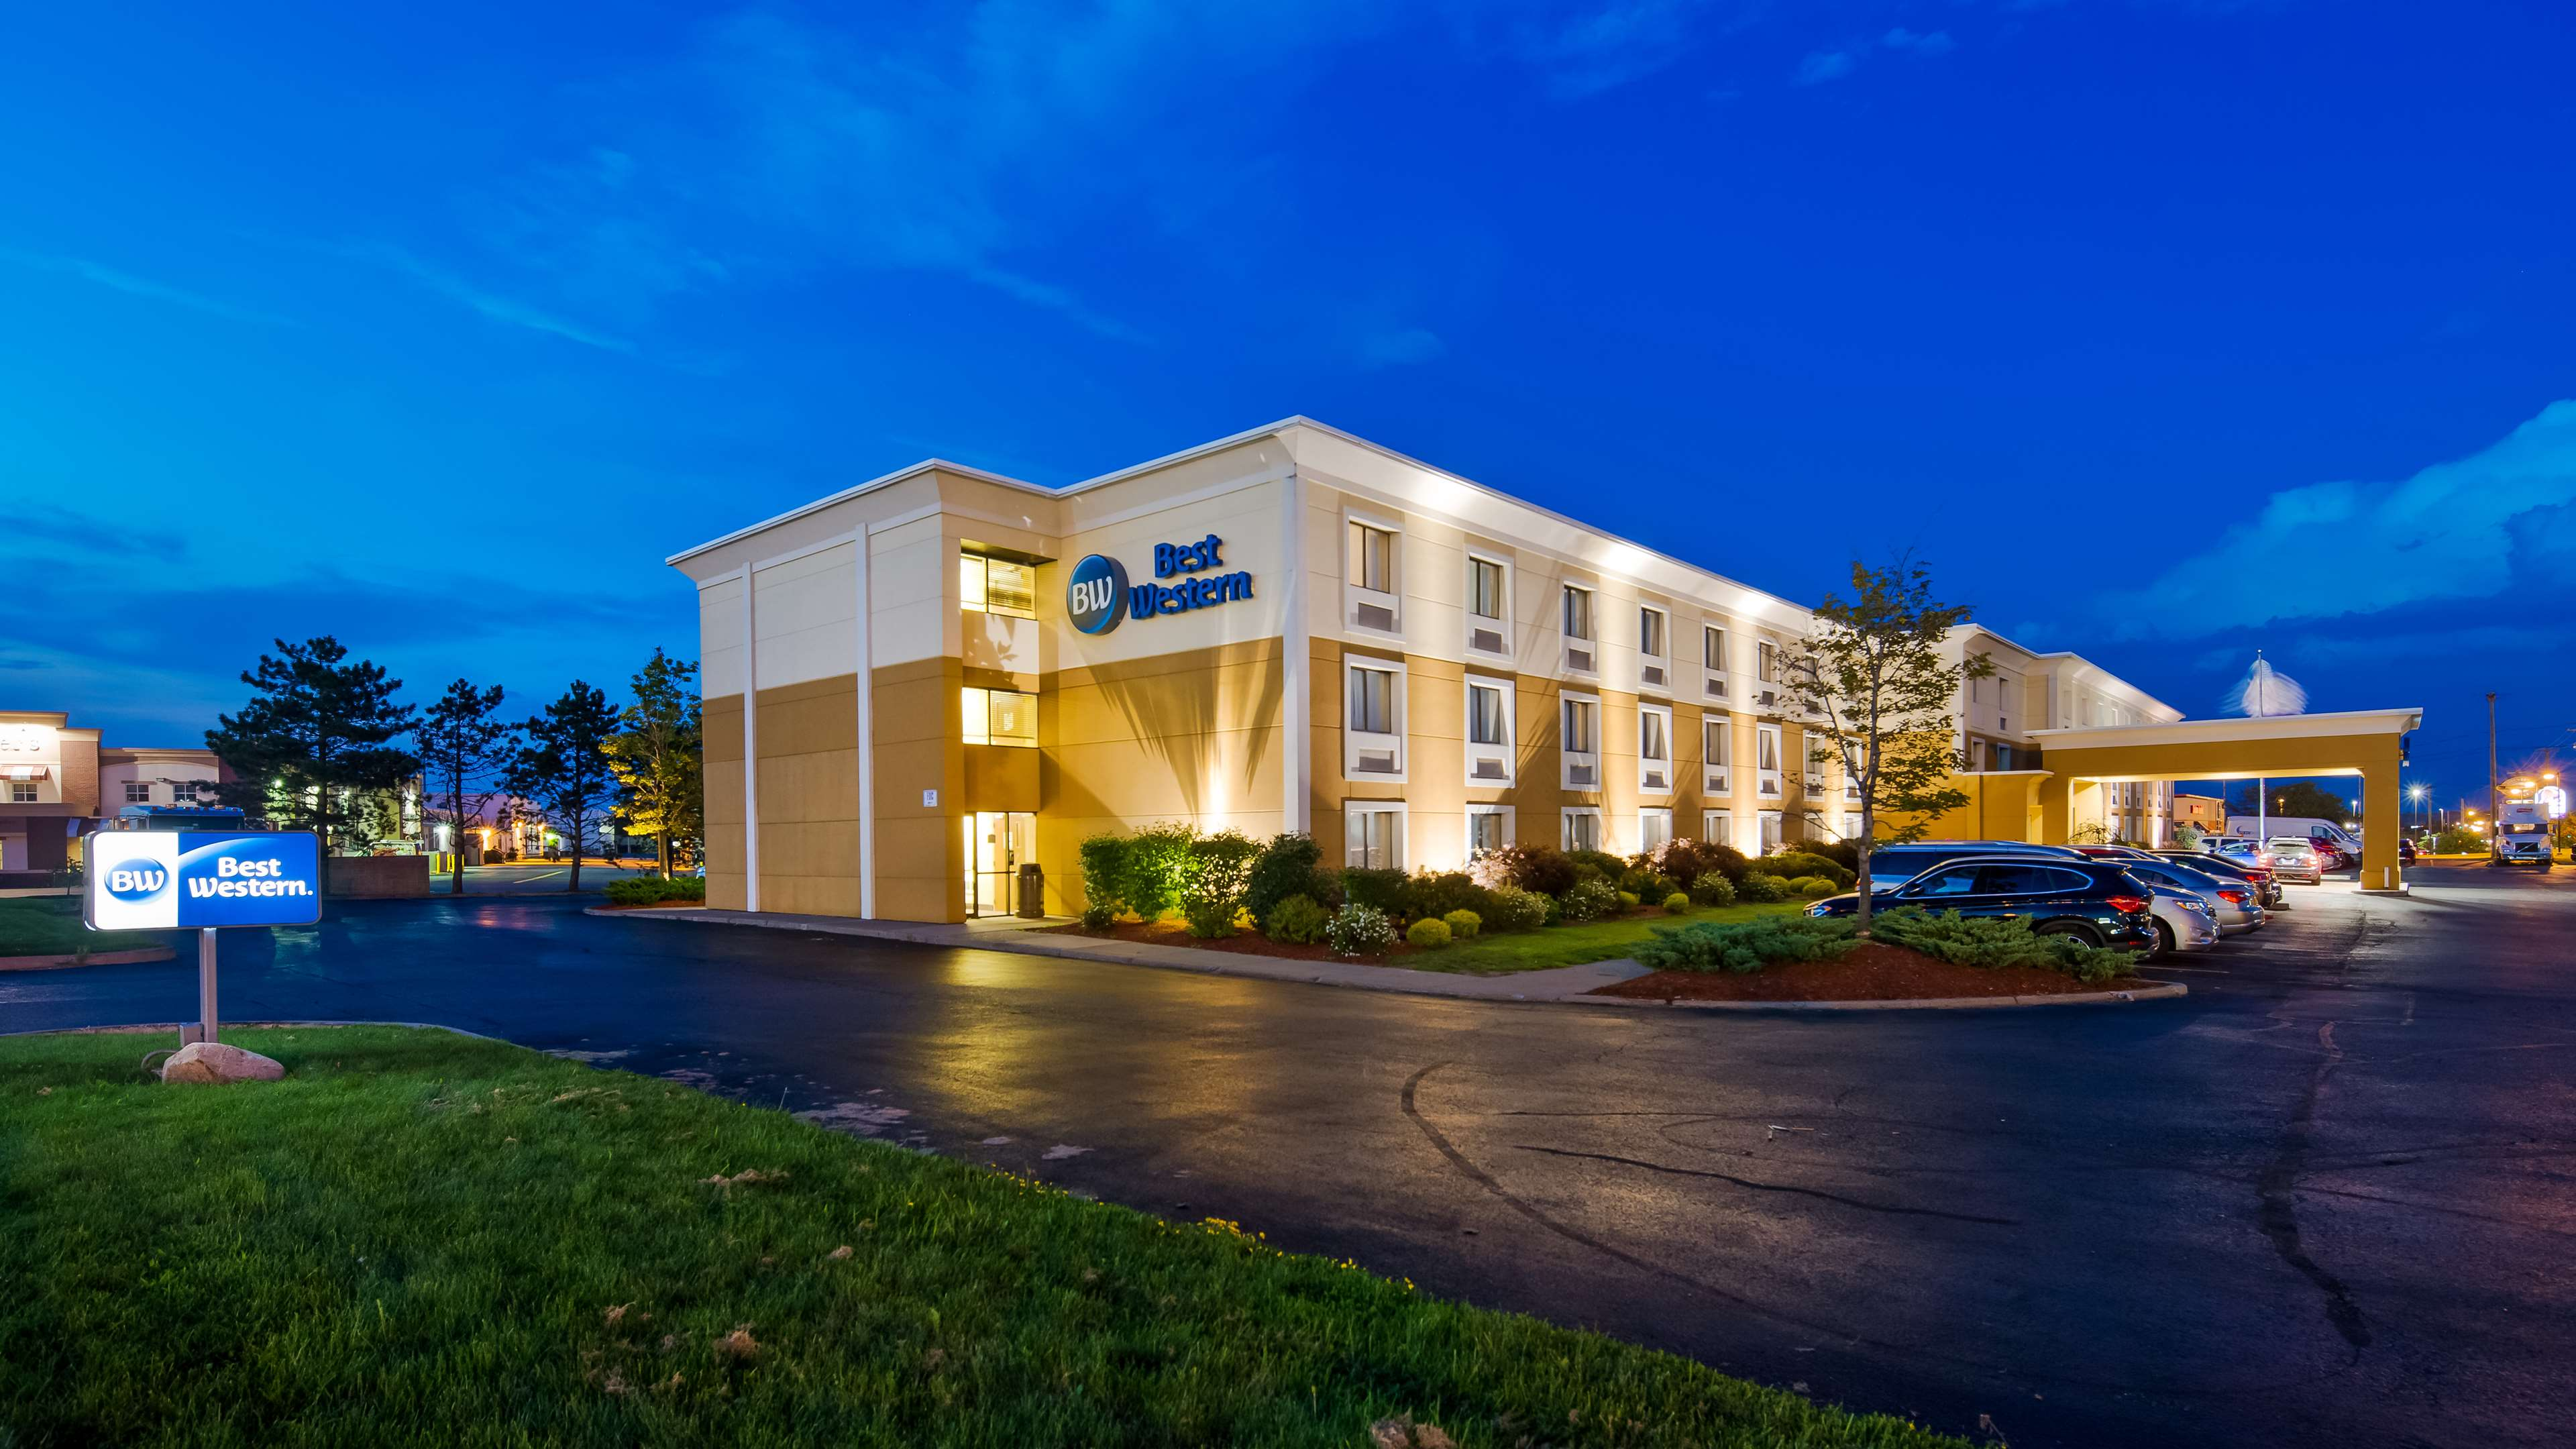 Hotels Motels Rochester Ny